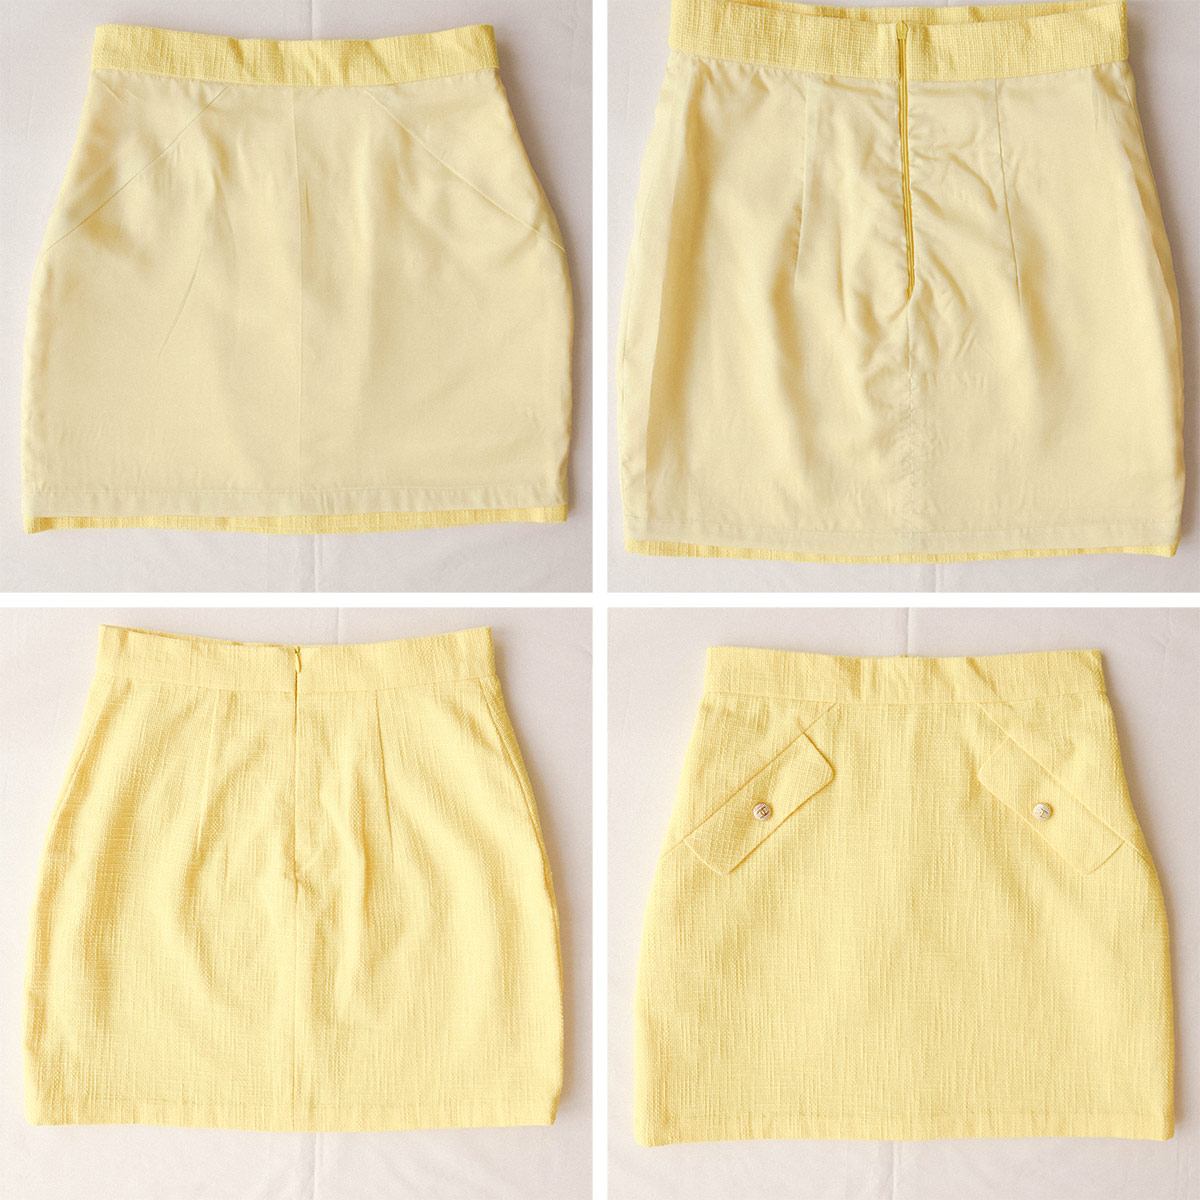 chanel-inspired-skirt-burda-thepetitecat-5